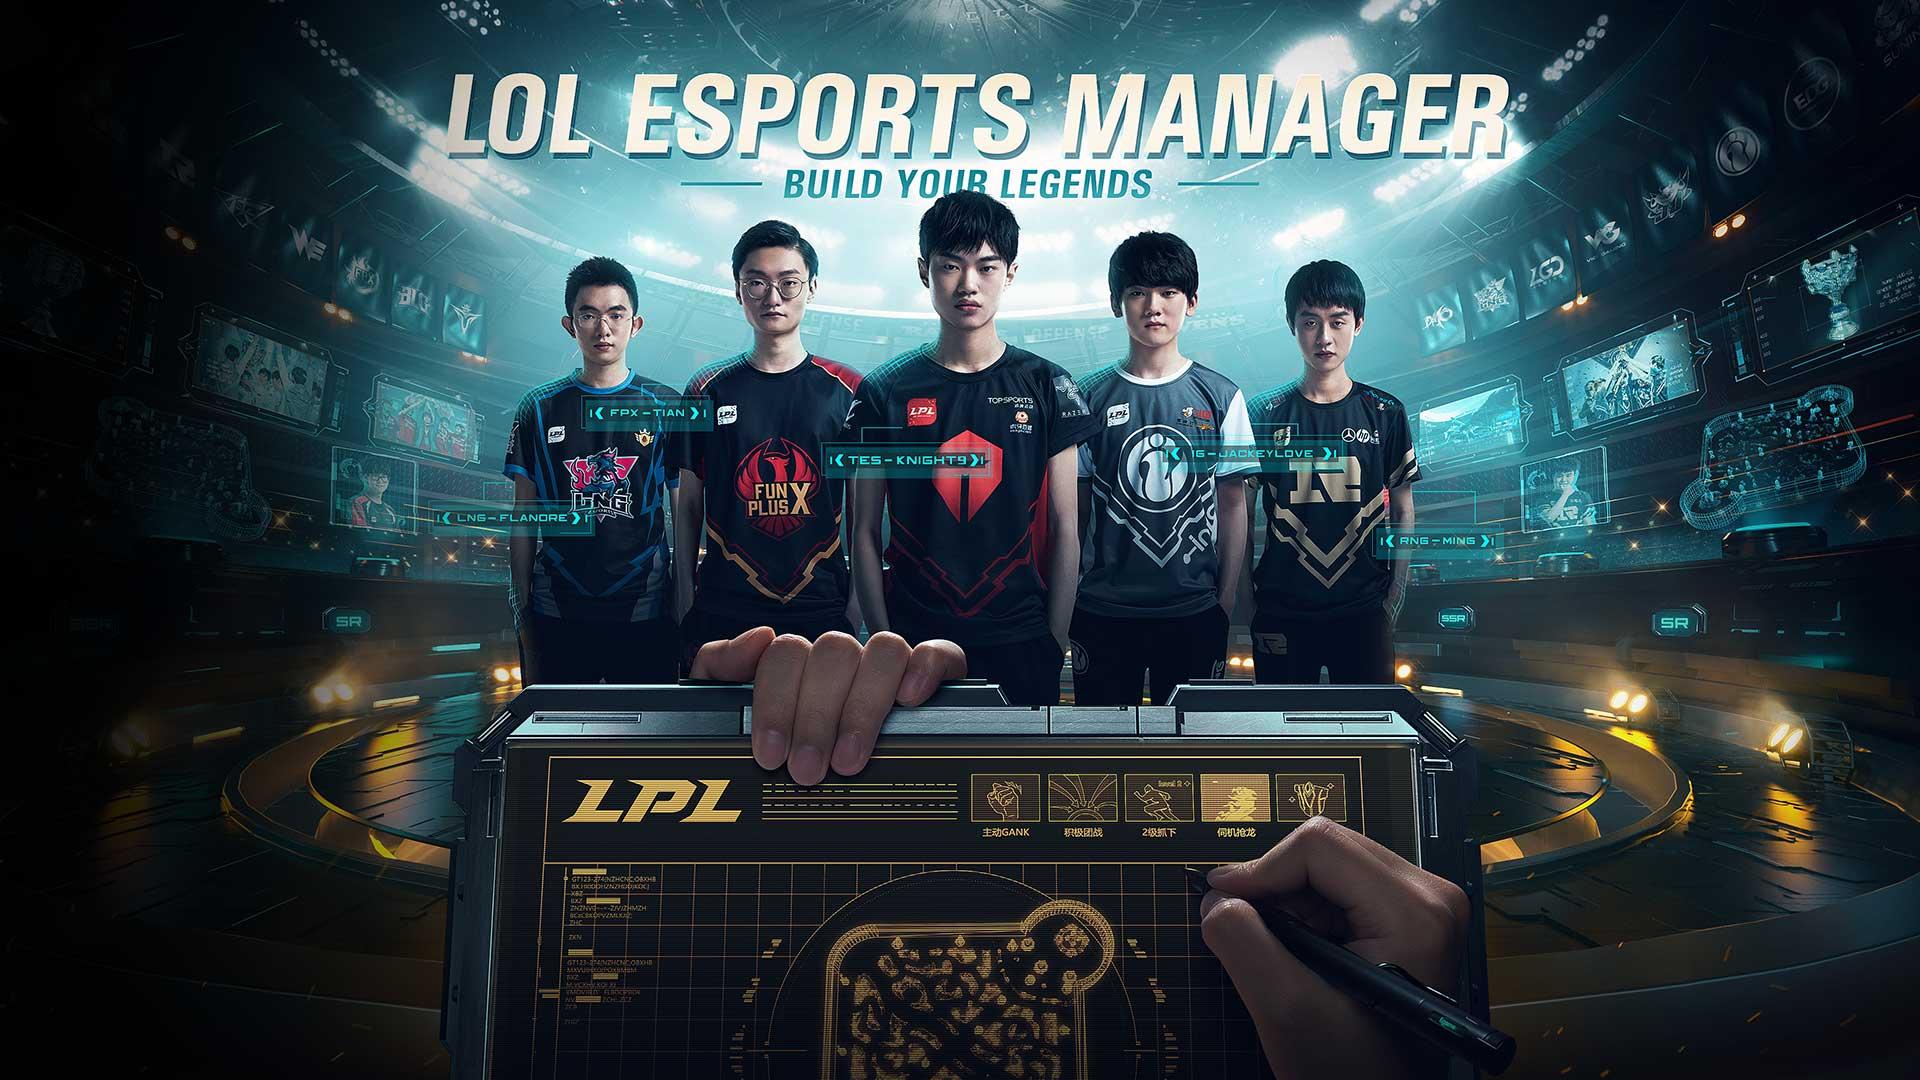 League of Legends Esports Manager, Legends of Runeterra, Arcane, league of legends